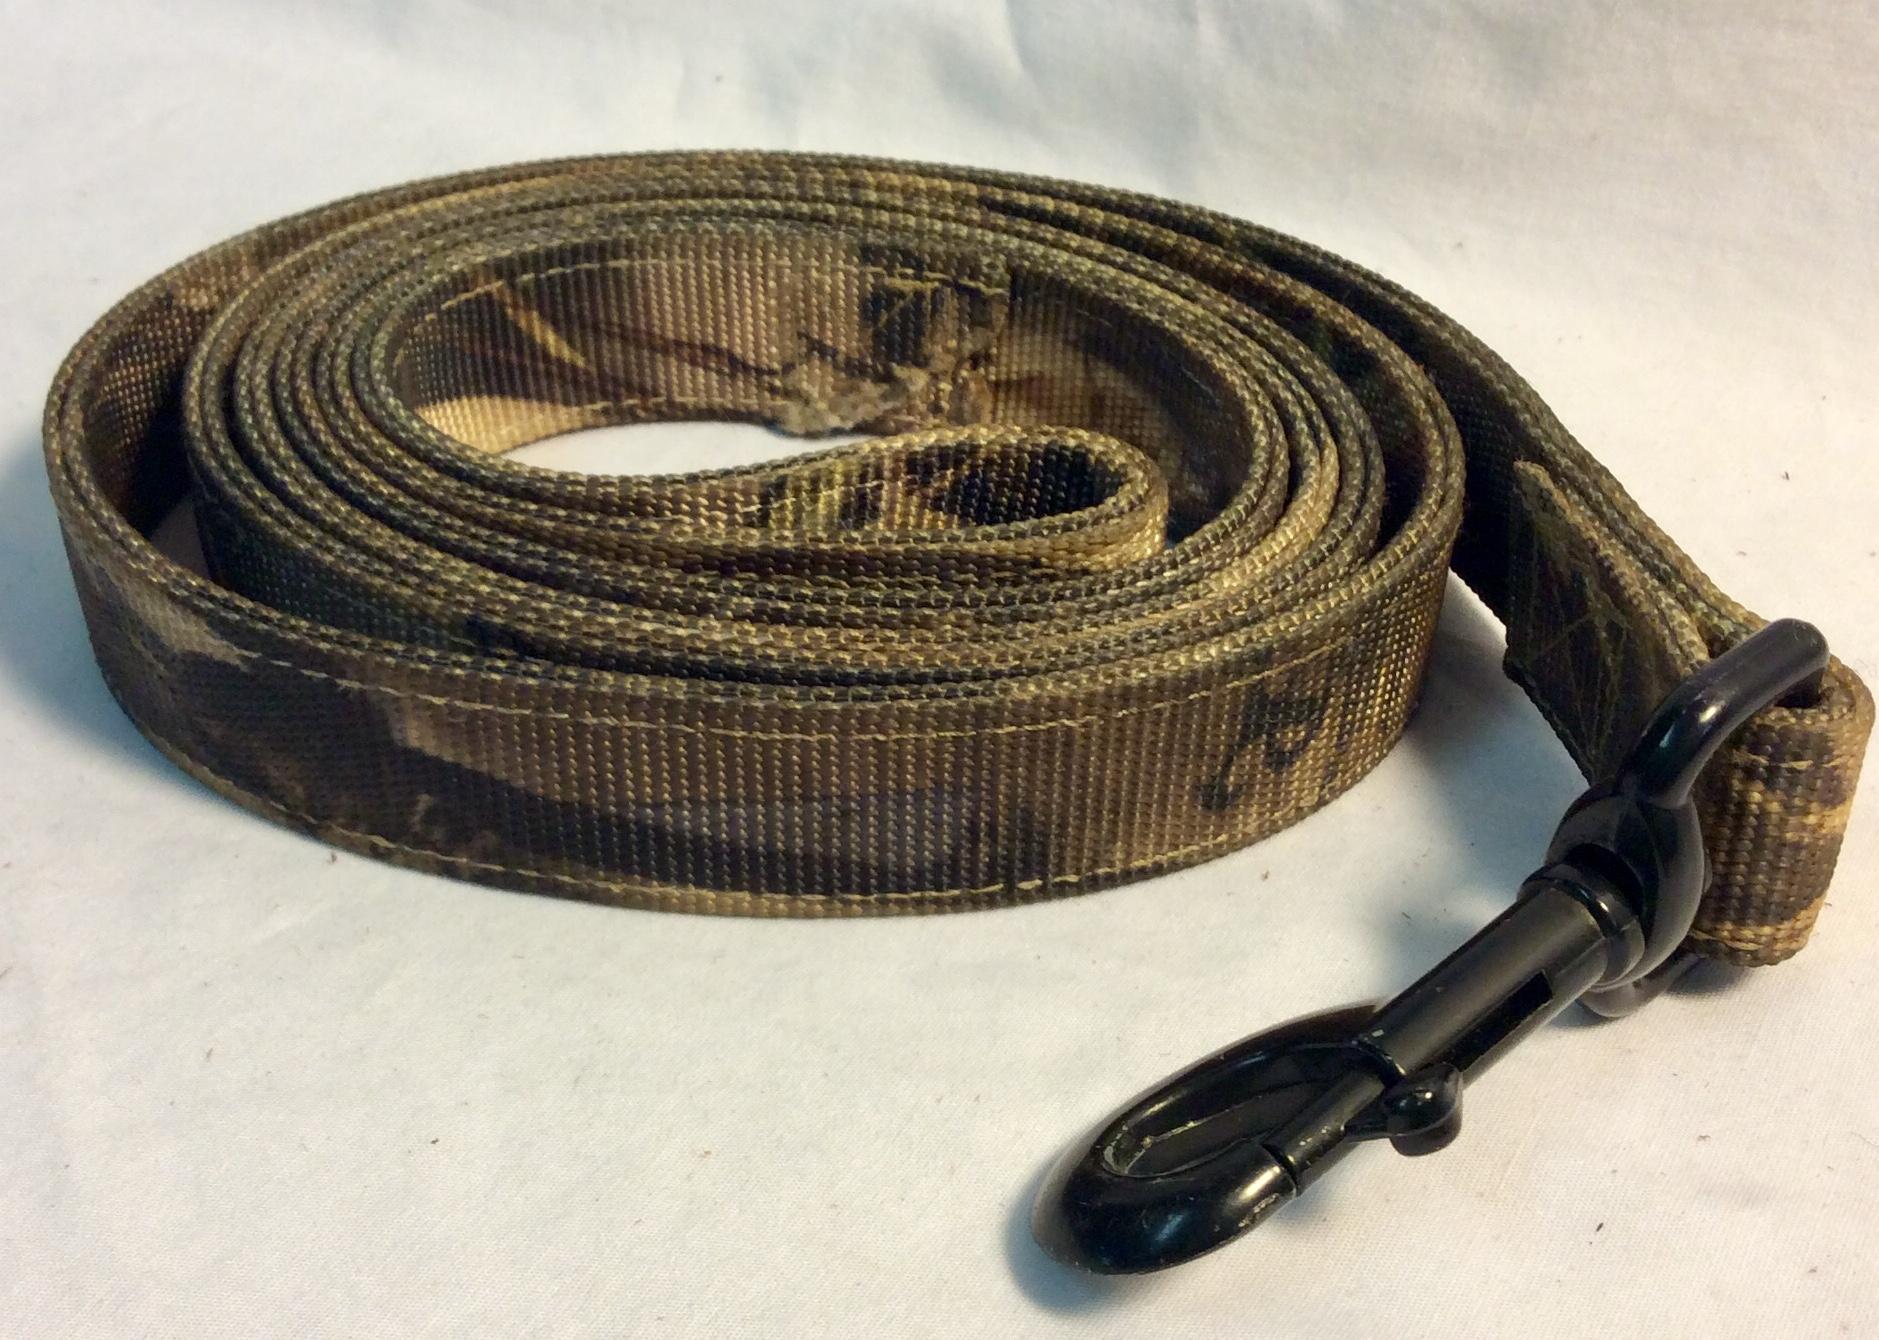 Red Head Camo nylon dog leash with metal buckle